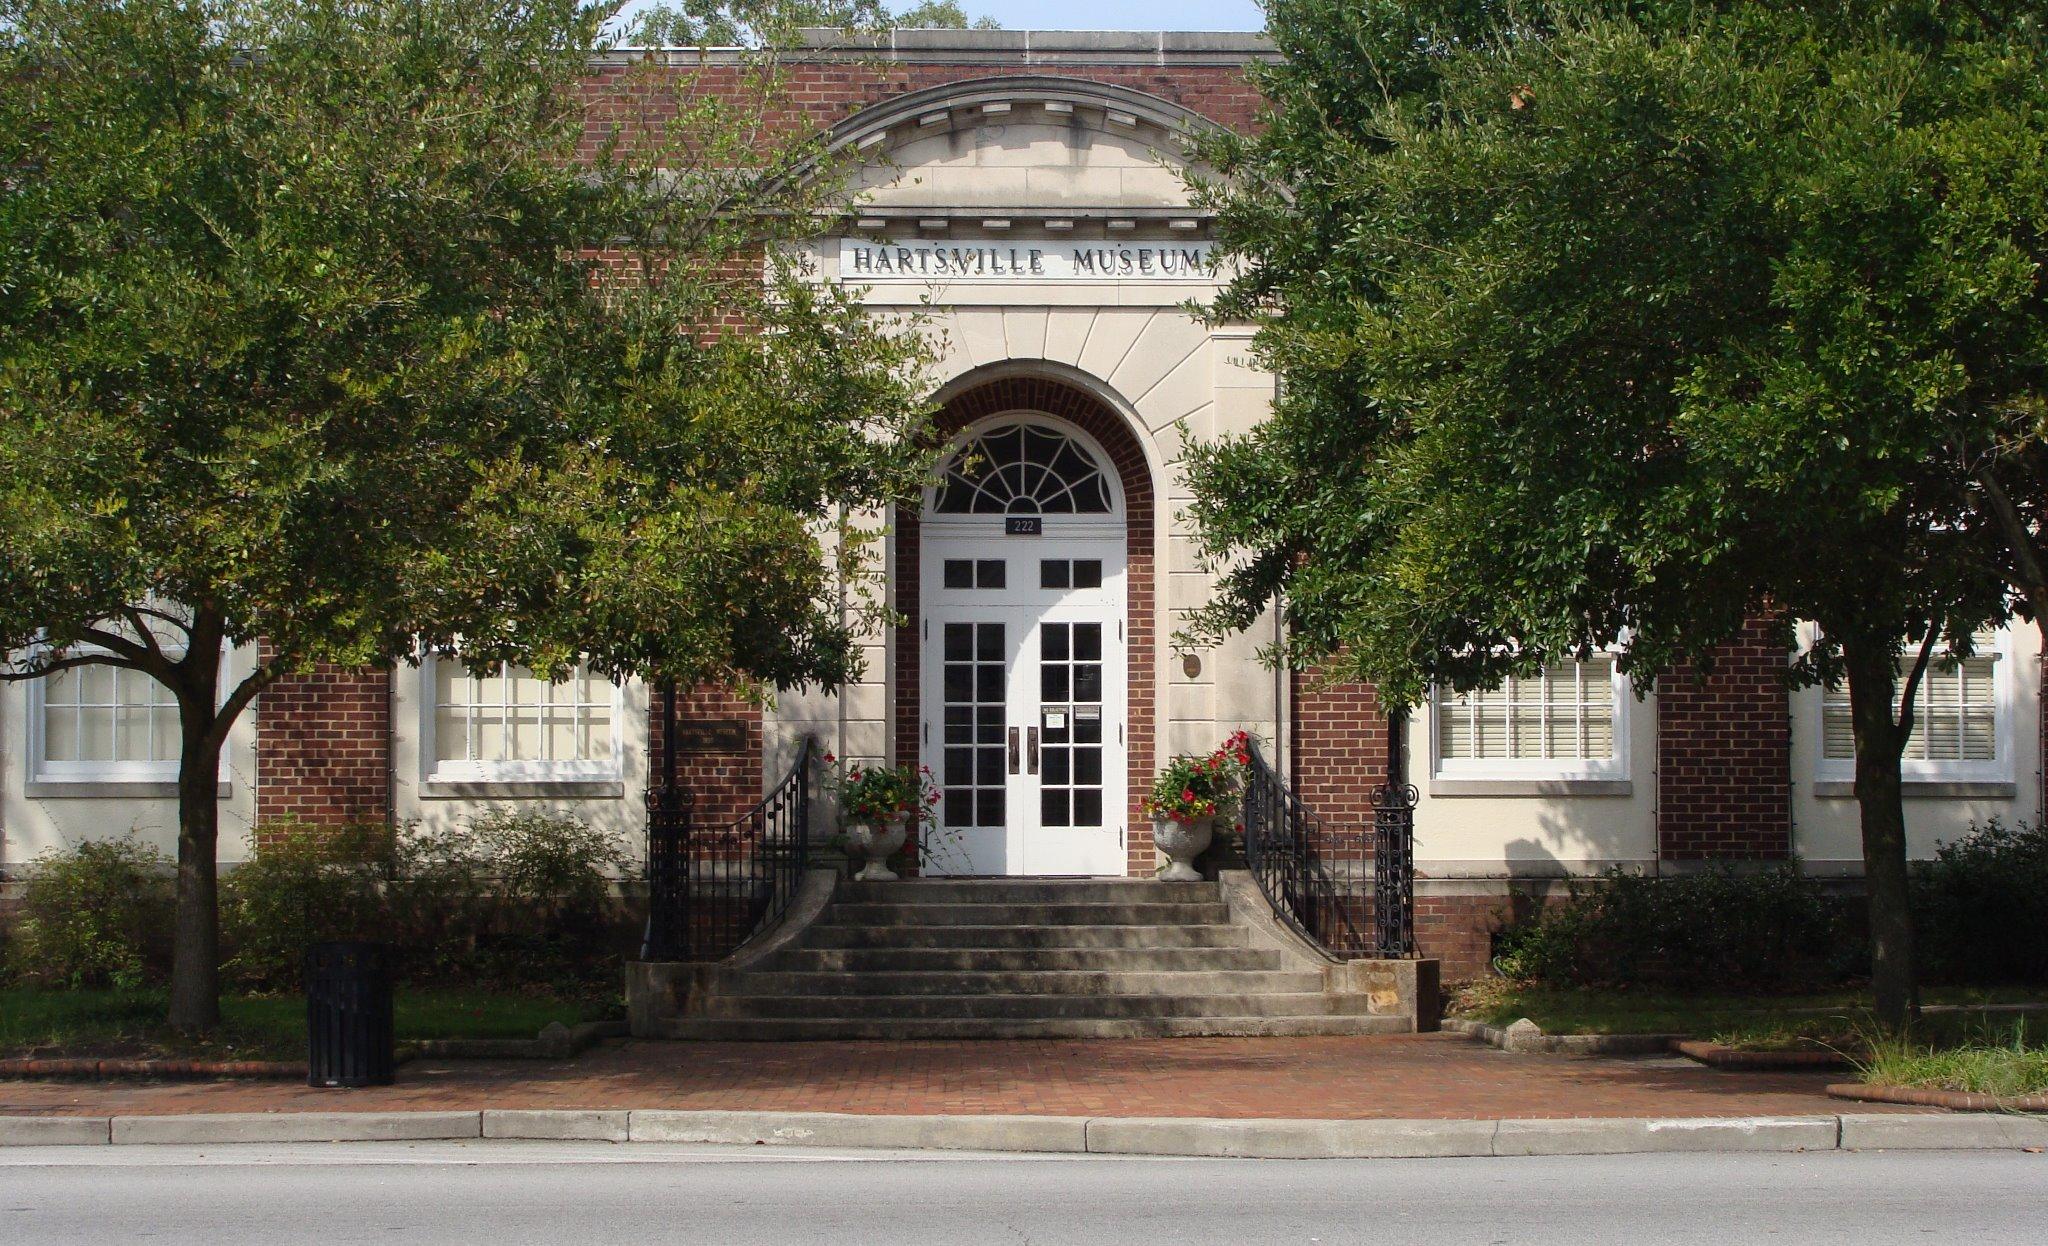 Hartsville Museum